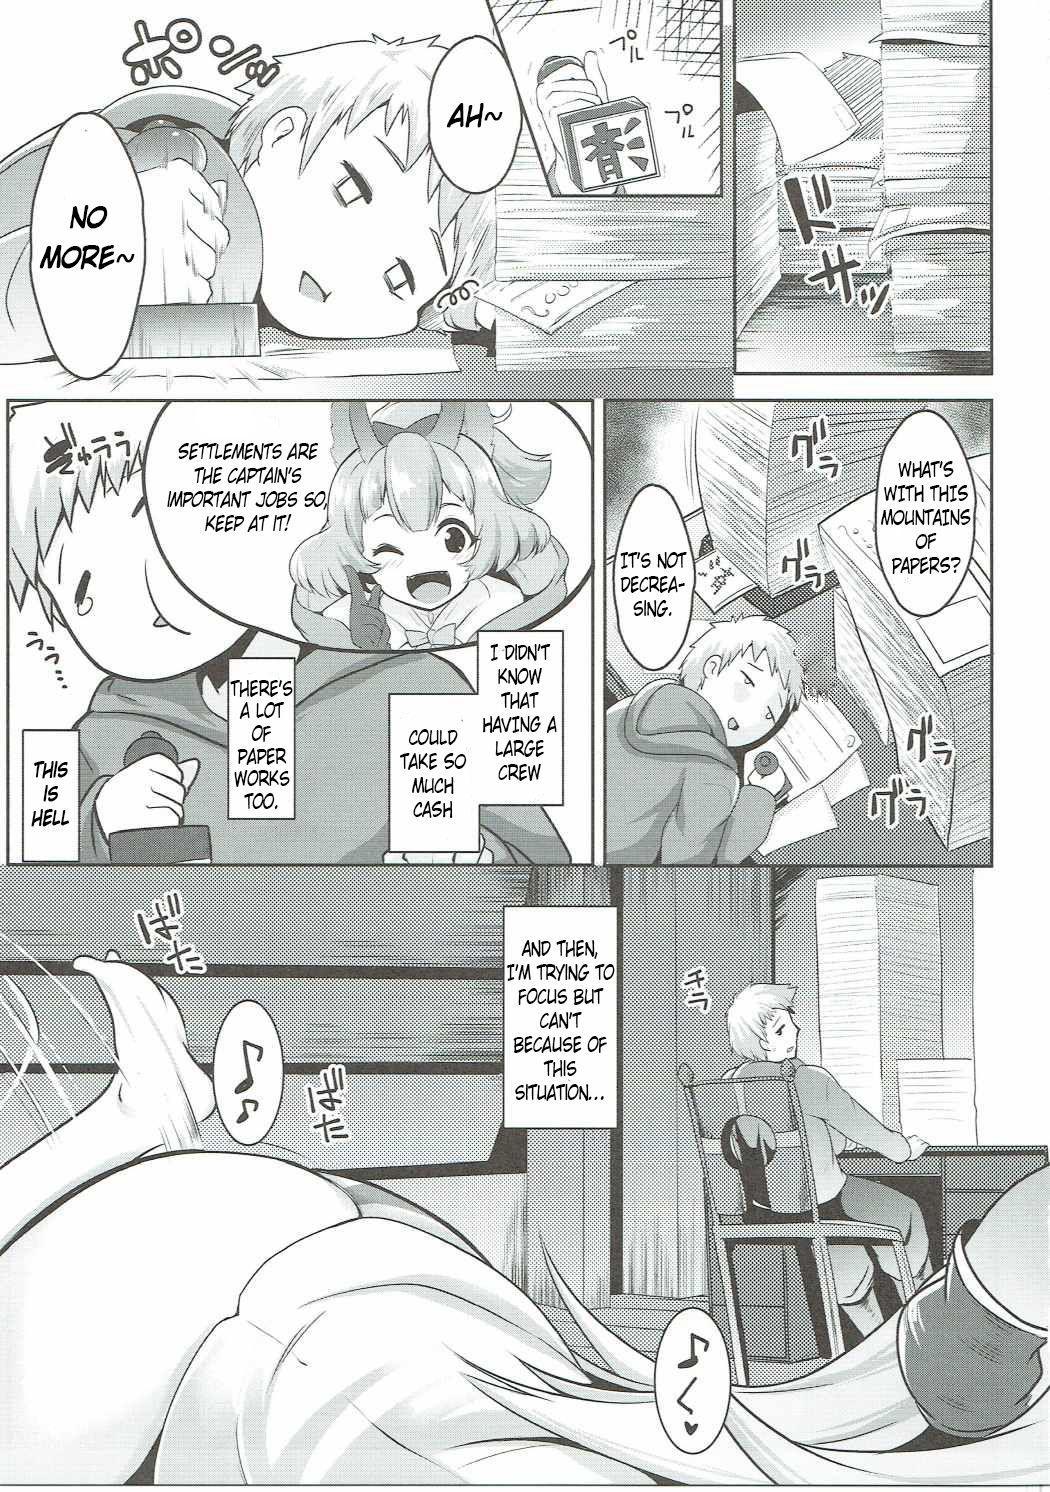 Uchi no Sarasa no Oppai ga Kininatte Shuuchuu Dekinai!   I'm Bothered by Sarasa's Breast So I Can't Focus! 3